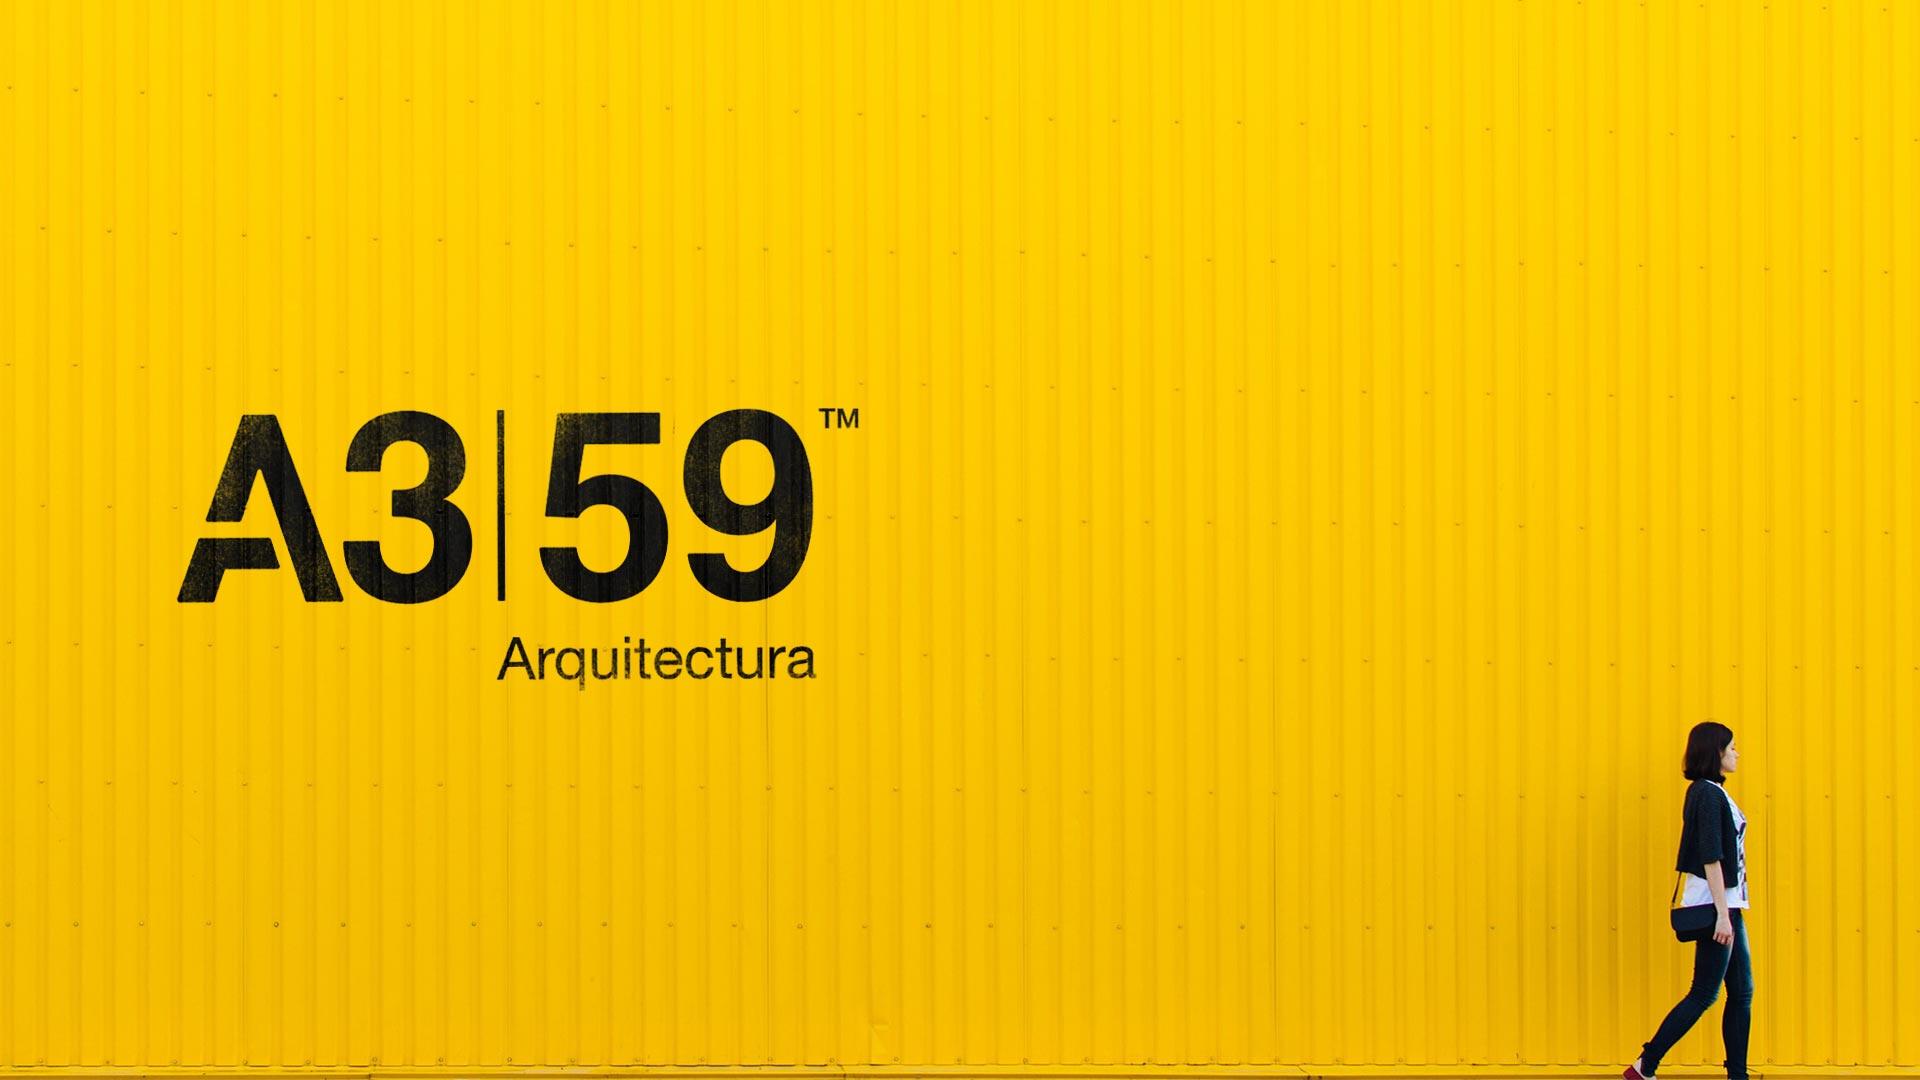 A359-4.jpg